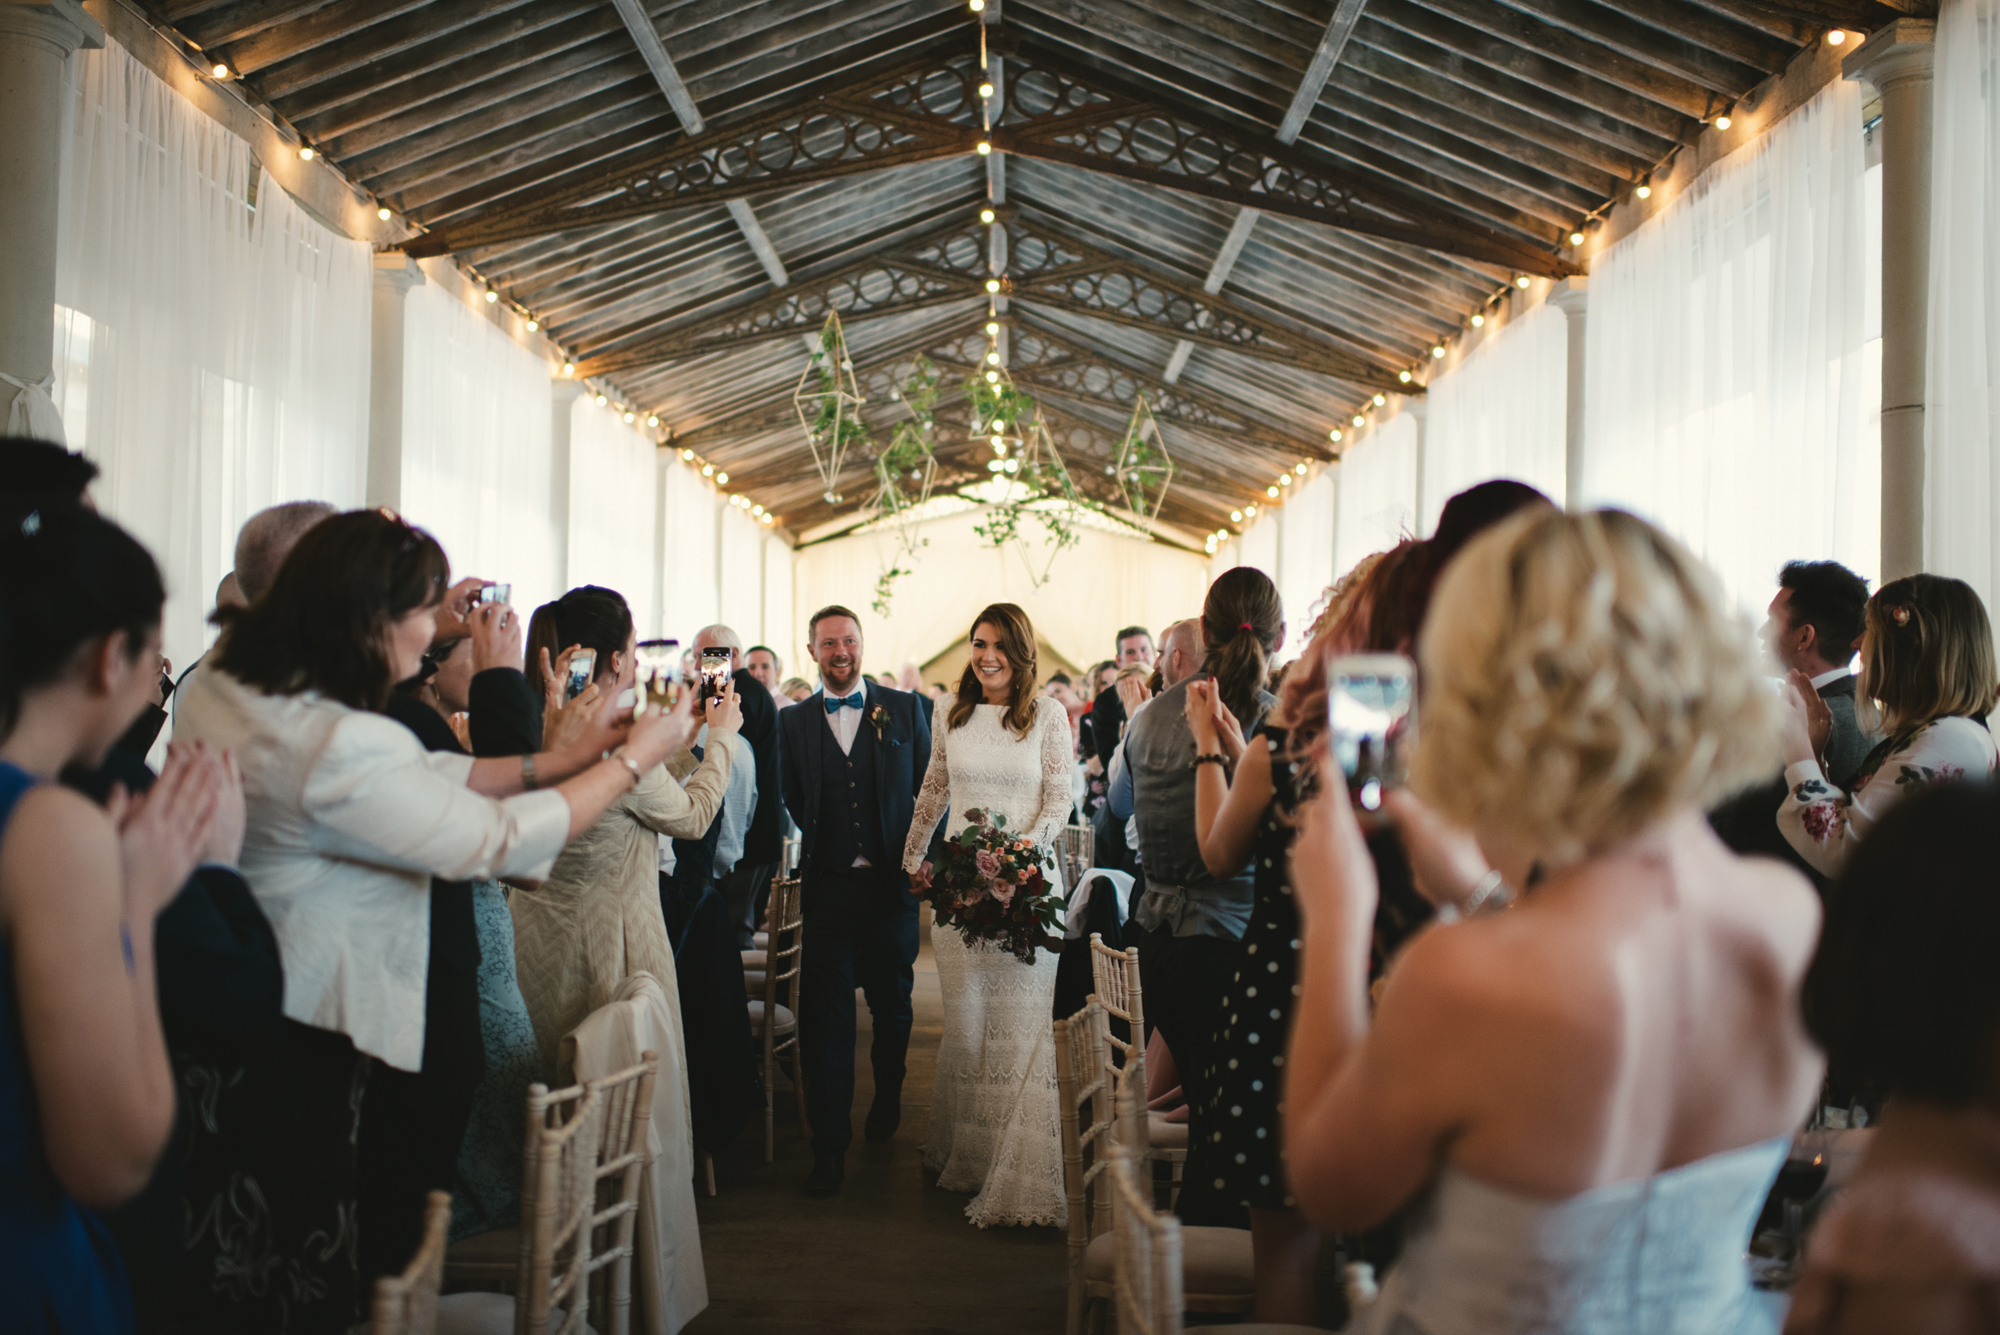 hillton_park_wedding_venue_ireland_ceremony_setting.jpg